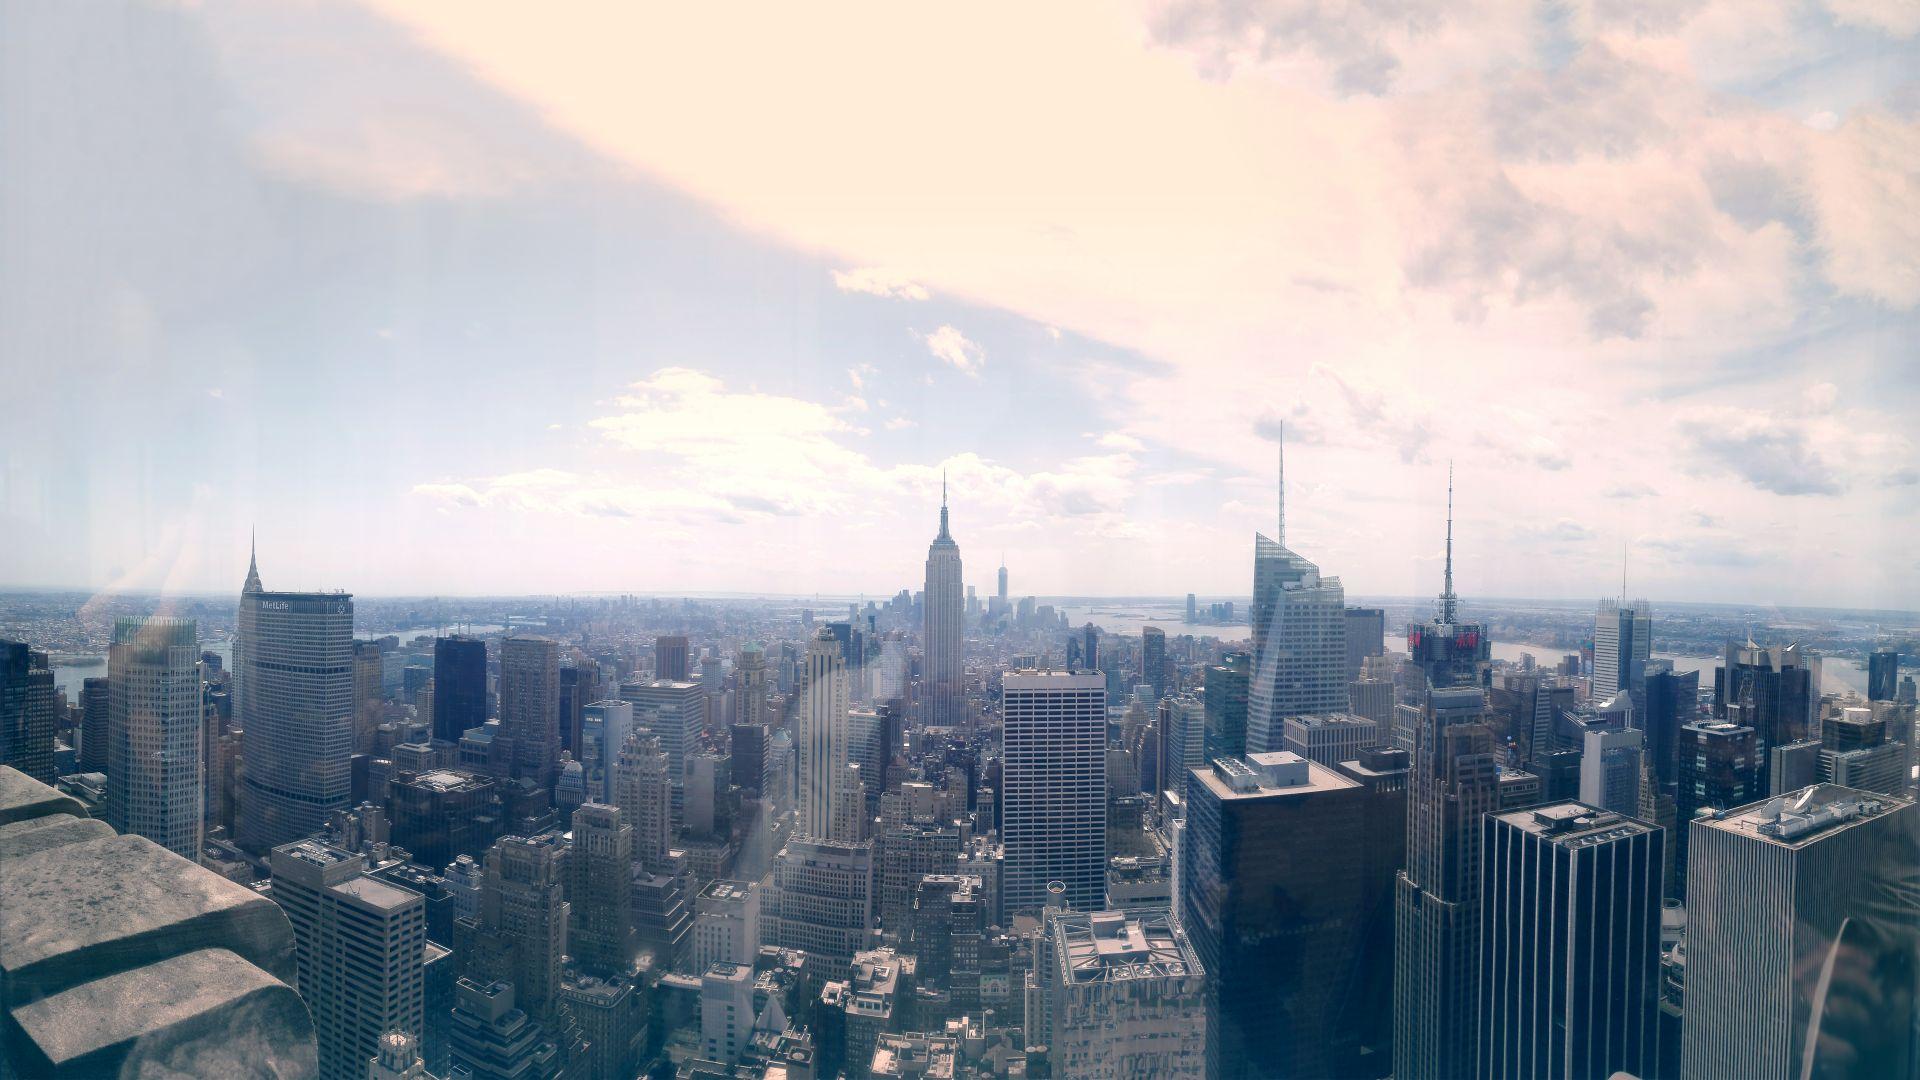 Wallpaper new york city usa skyscrapers travel tourism for Wallpaper home usa